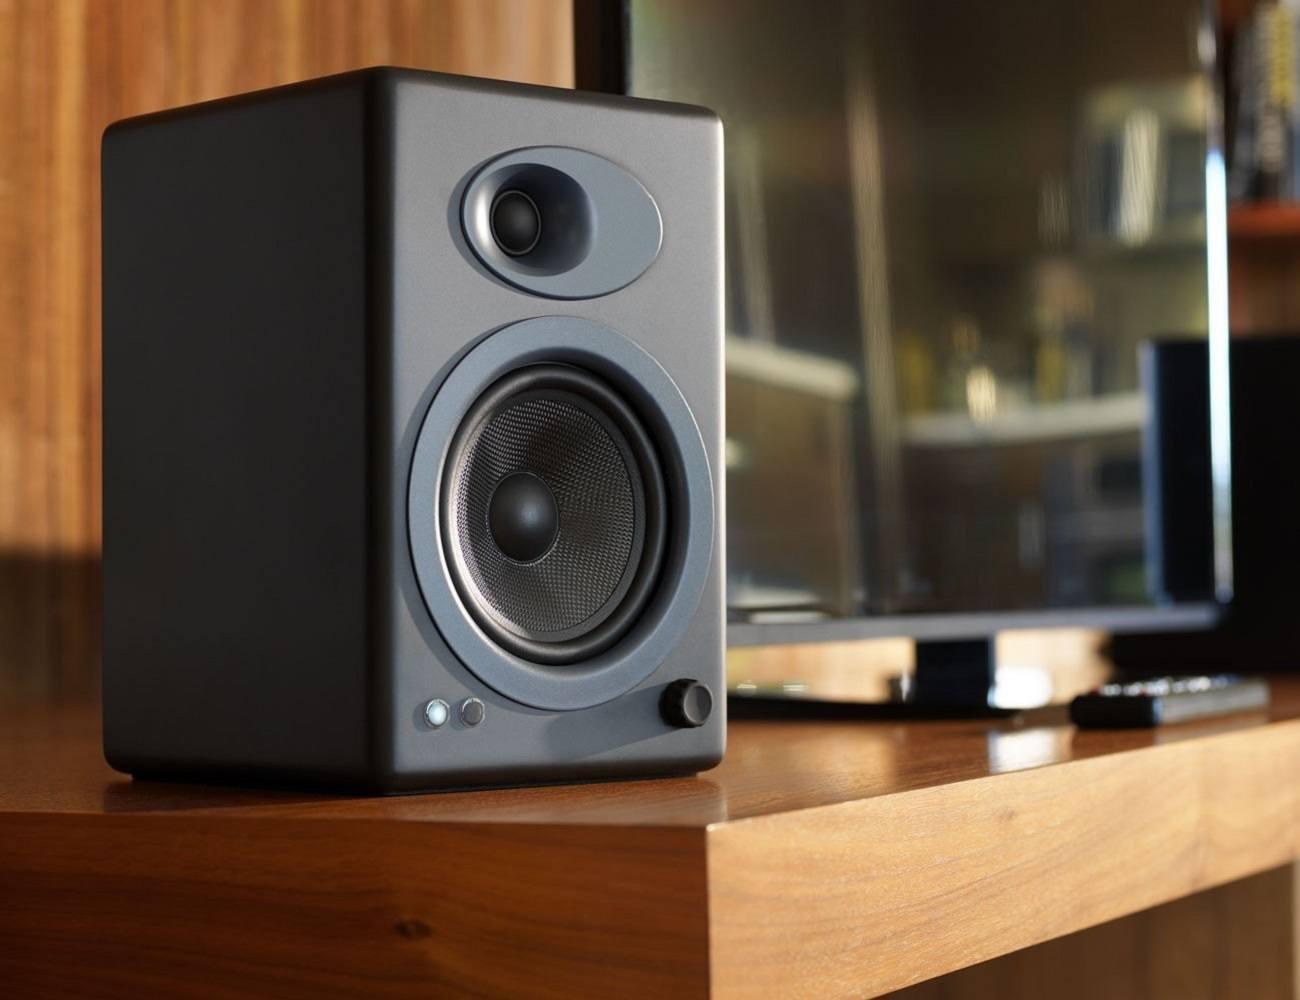 AudioEngine A5 Speakers » Gadget Flow